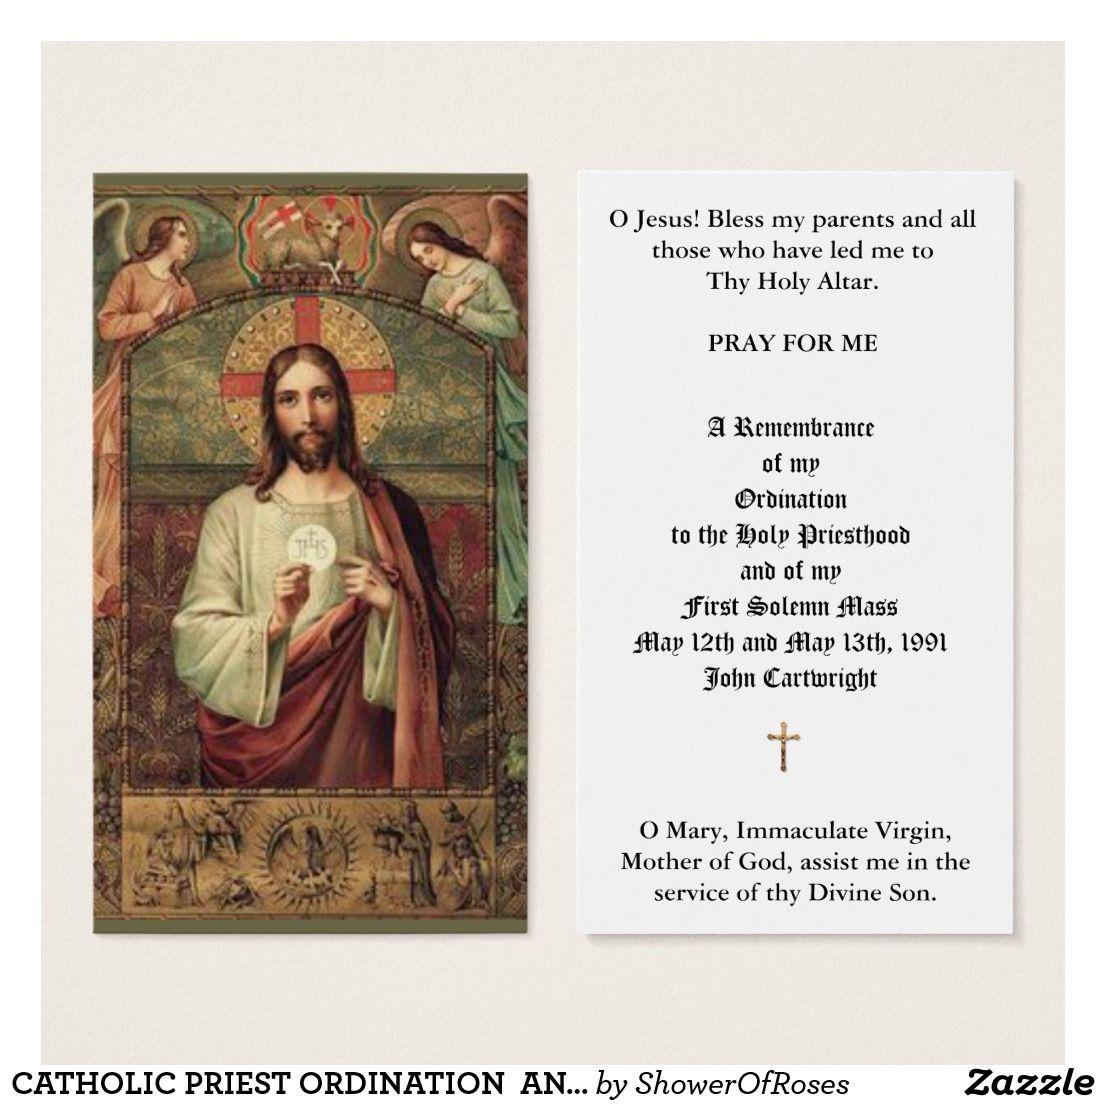 Catholic Priest Ordination Anniversary Holy Cards Zazzle Com